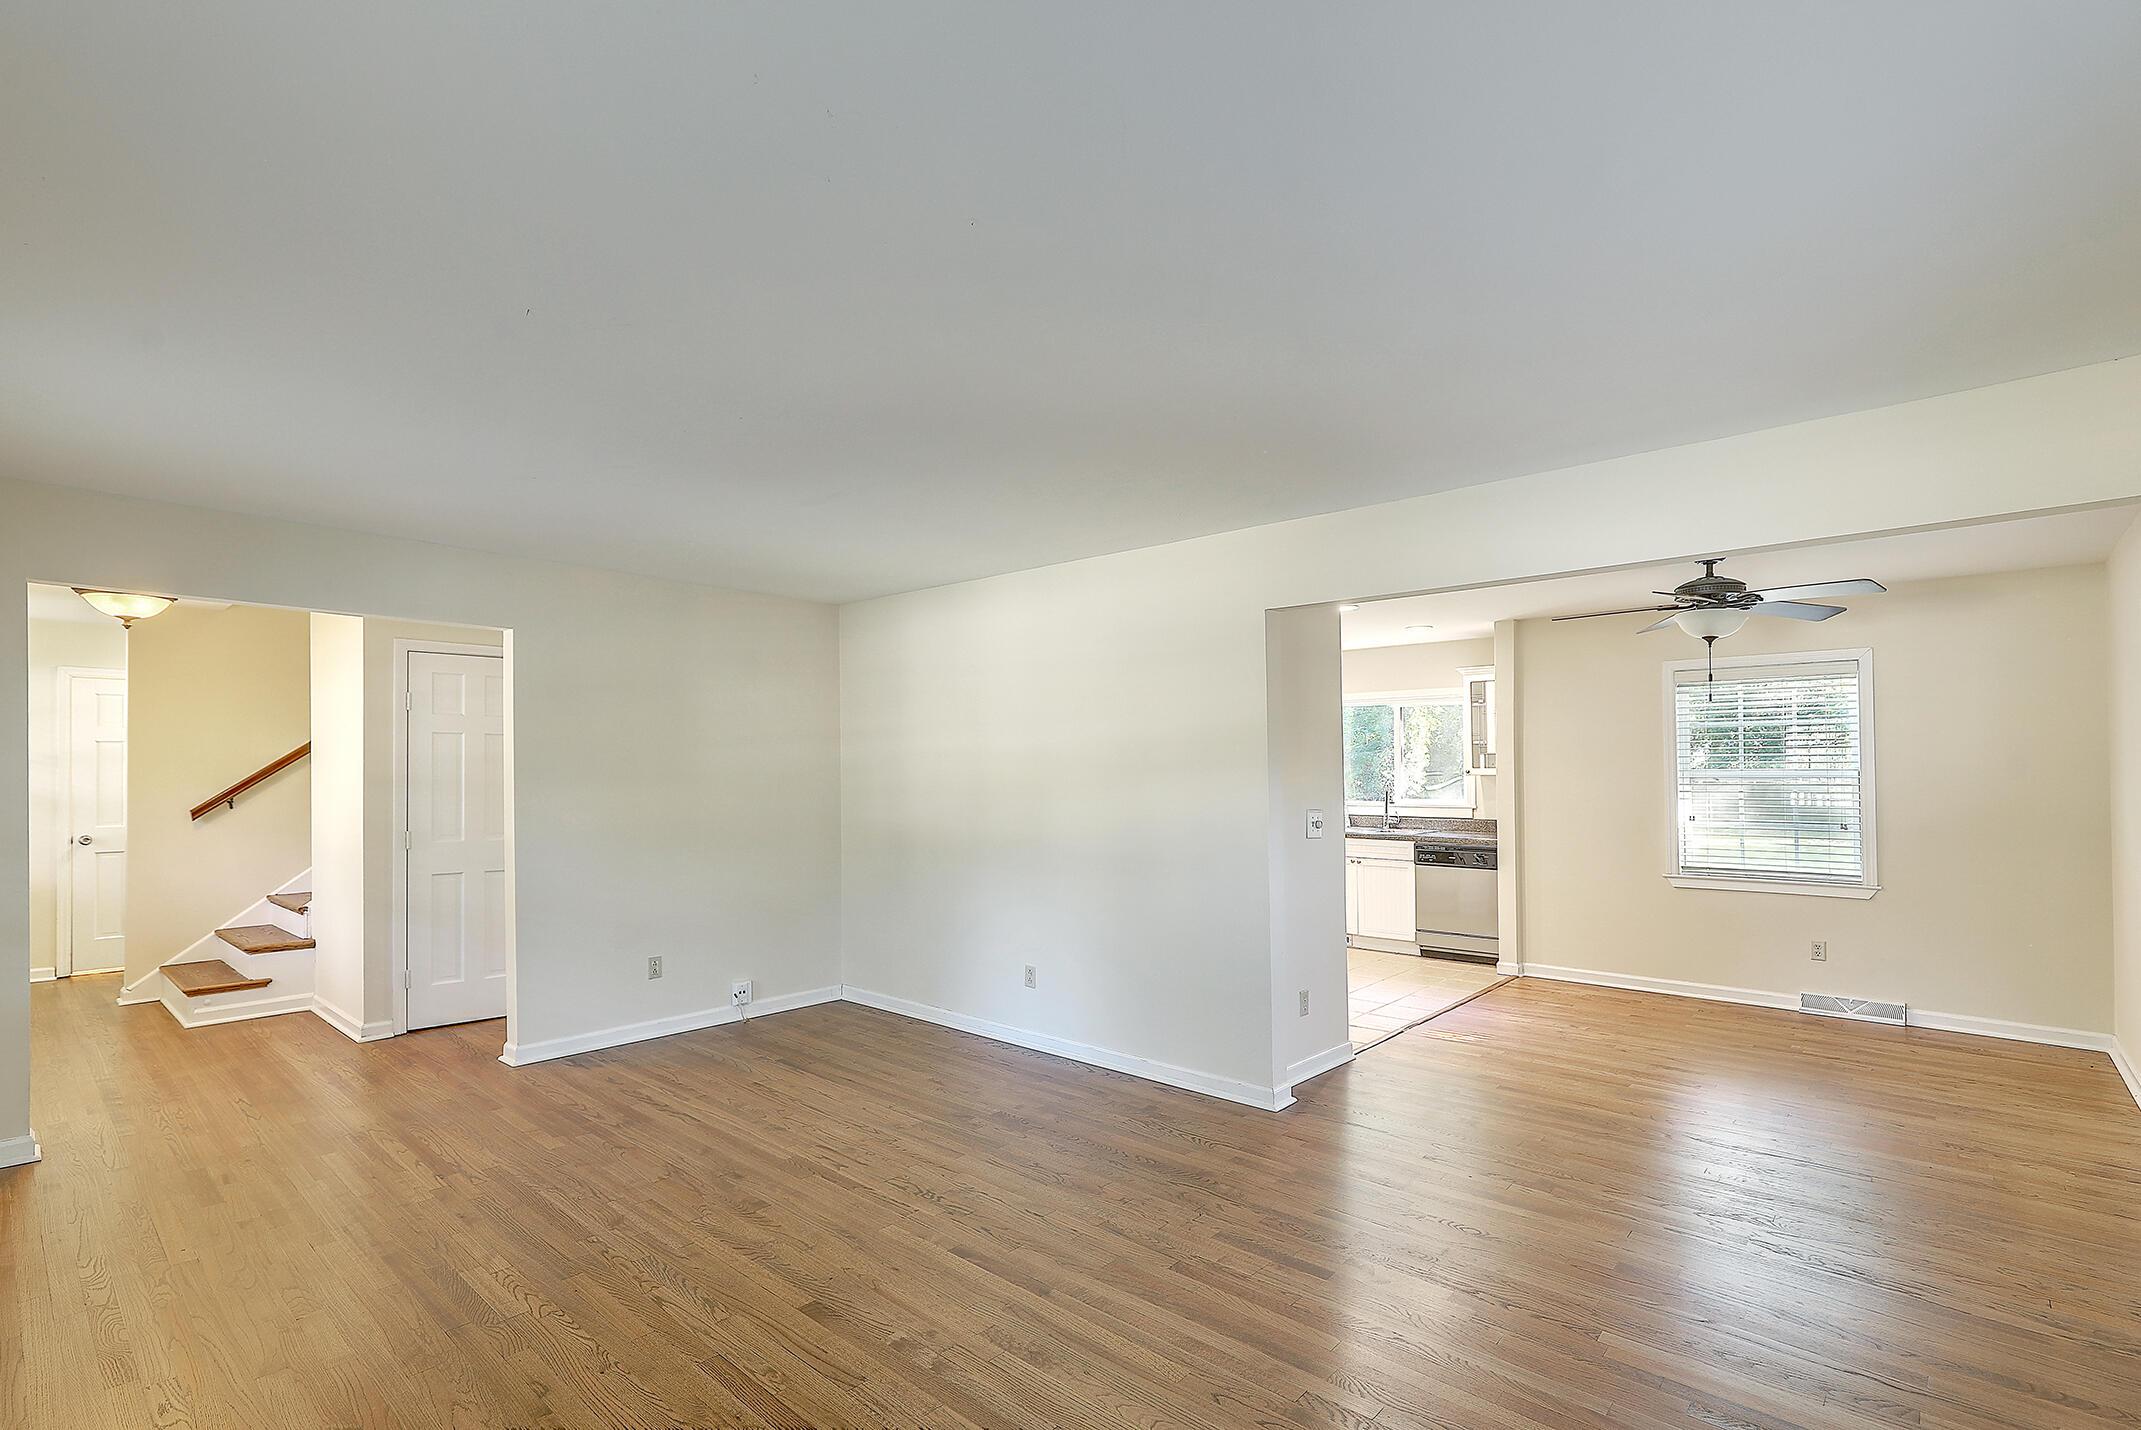 Cooper Estates Homes For Sale - 901 Searle, Mount Pleasant, SC - 0